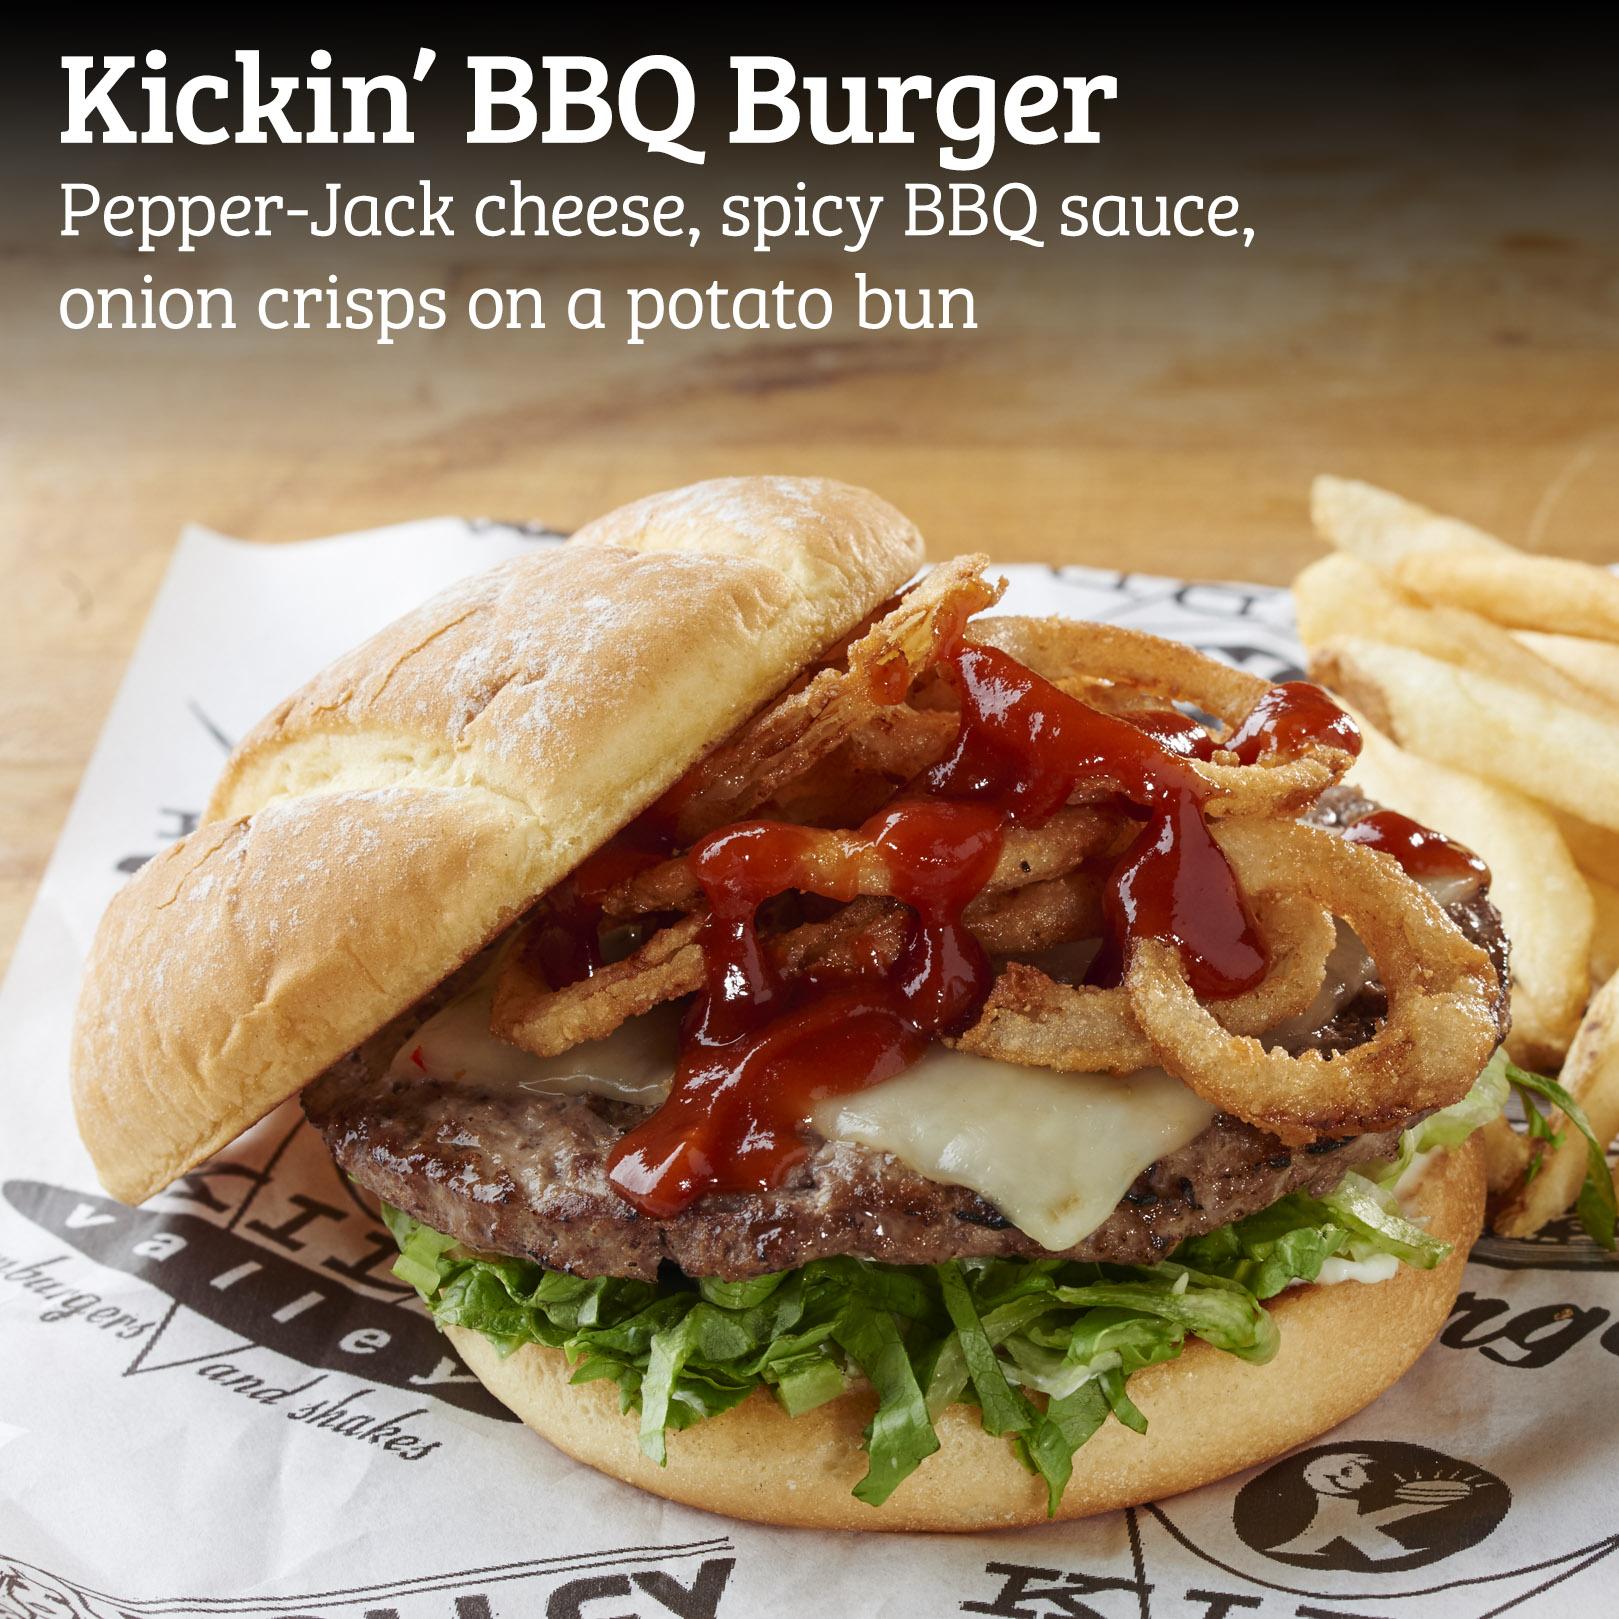 Kidd Valley Kickin' BBQ Burger